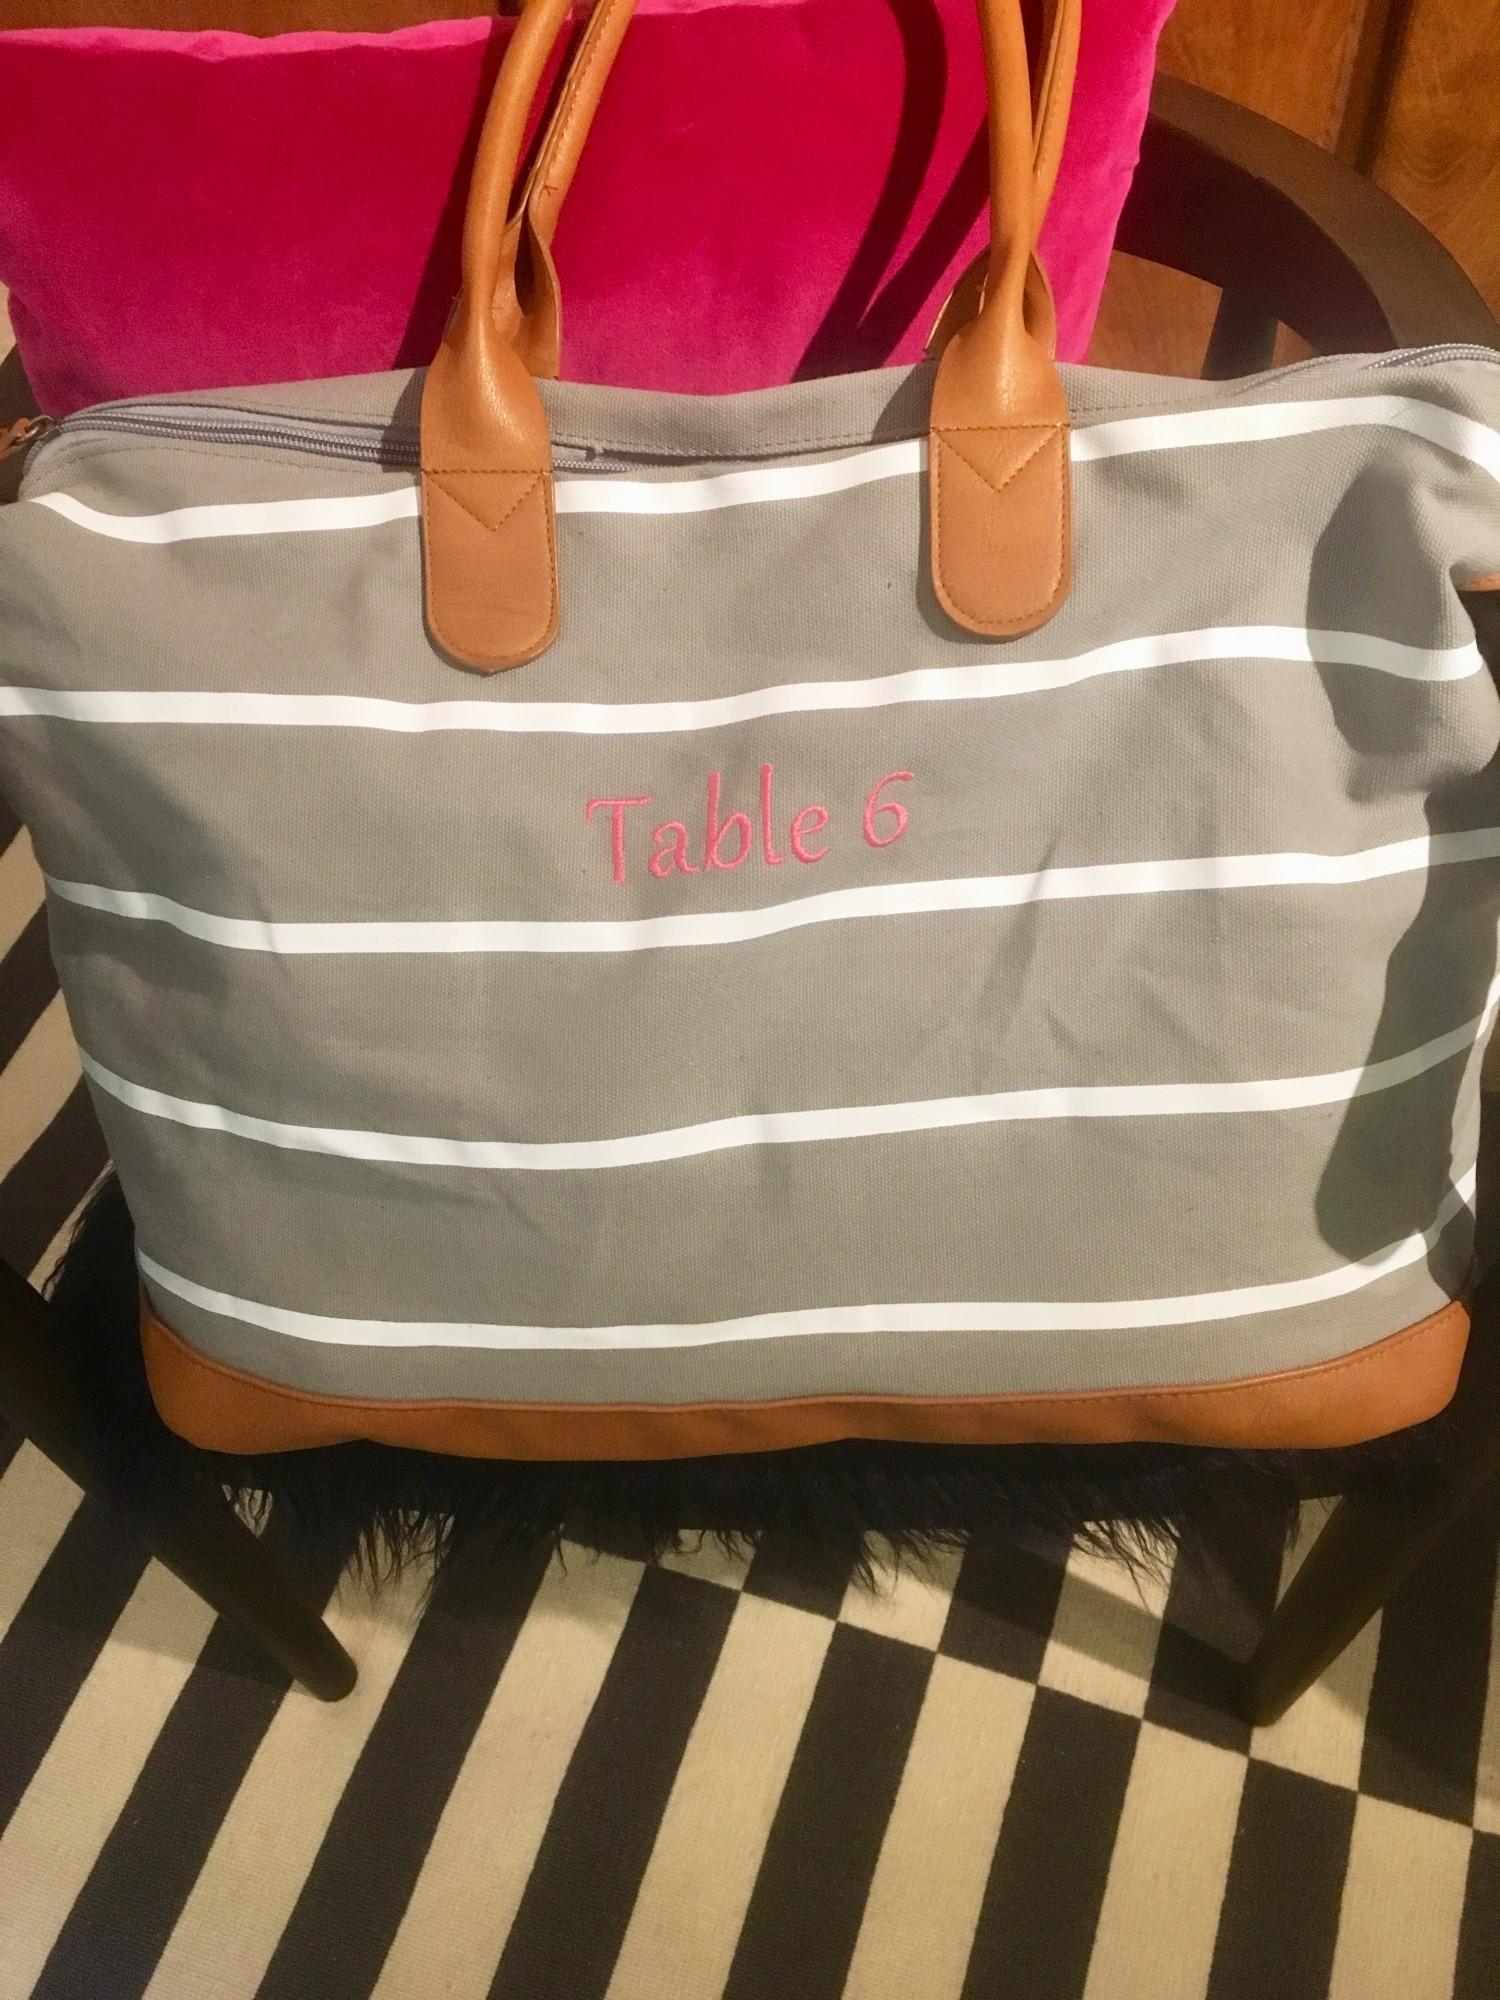 The Cutest Beach Bag for Your Bridesmaid